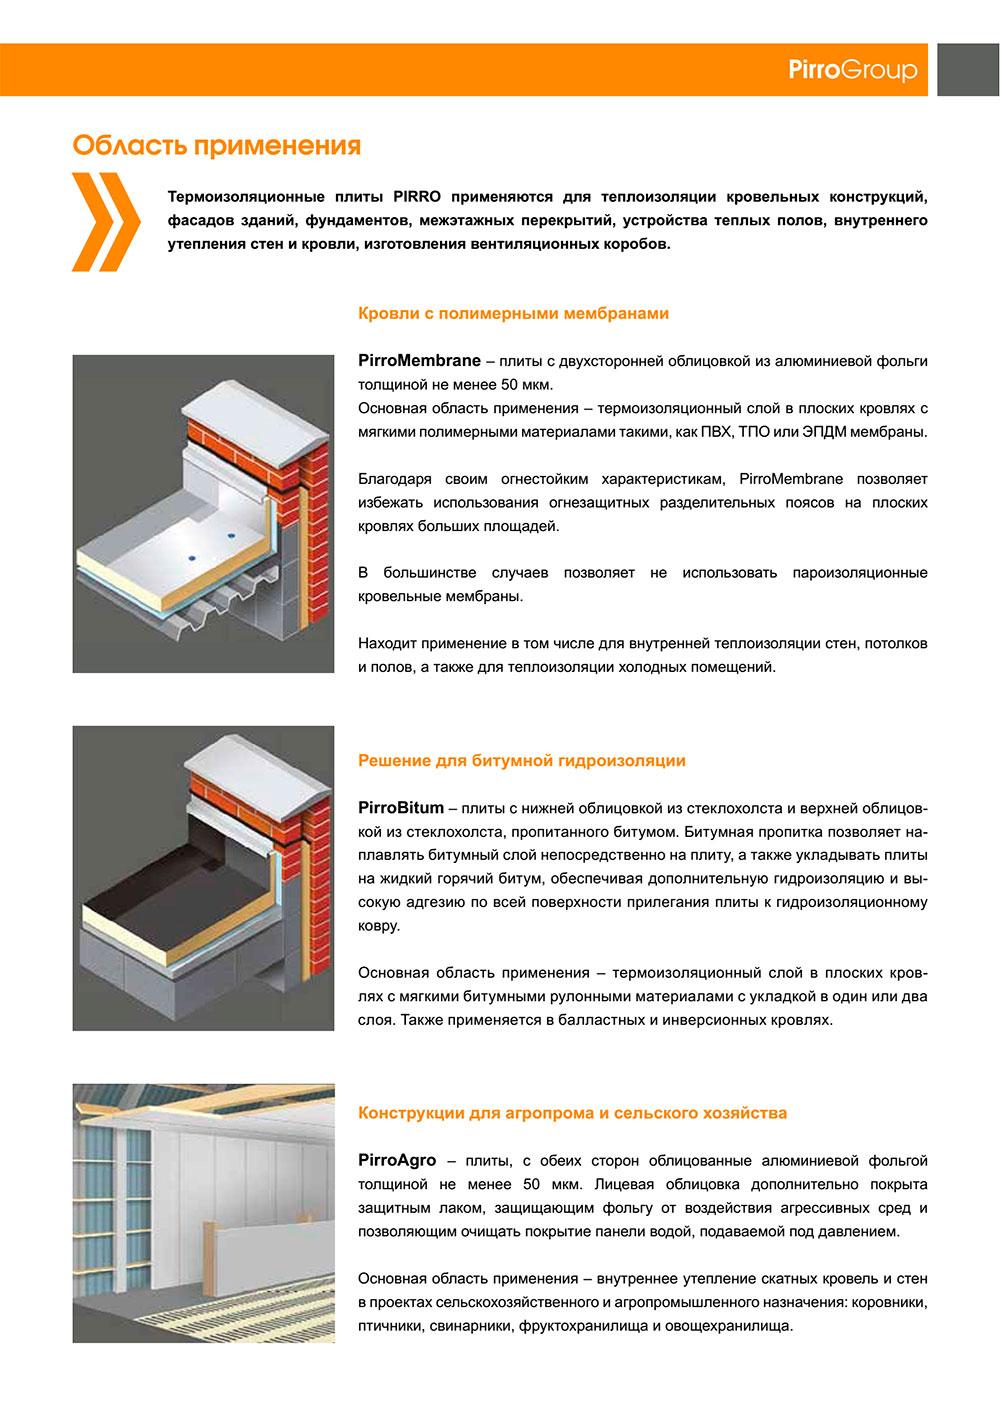 Утепление дома, балкона и бани плитами logicpir: описание характеристик и преимущества материала